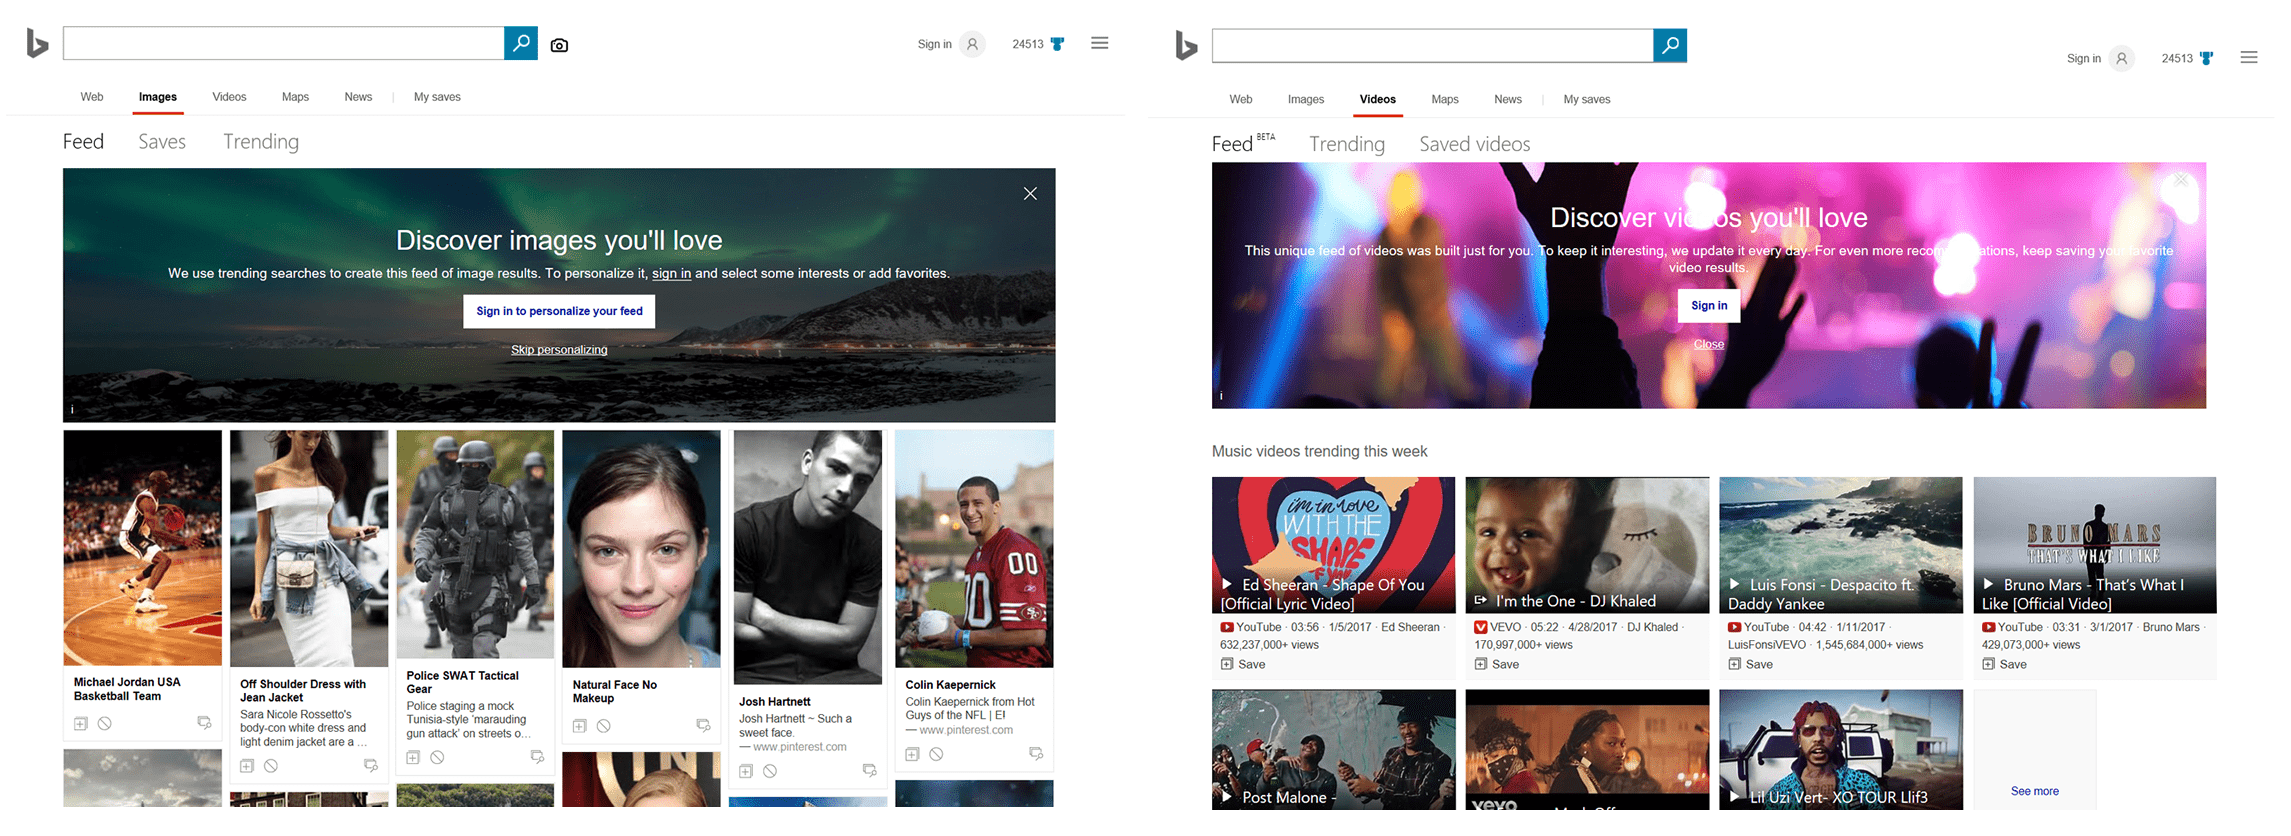 Bing-images-videos-interets